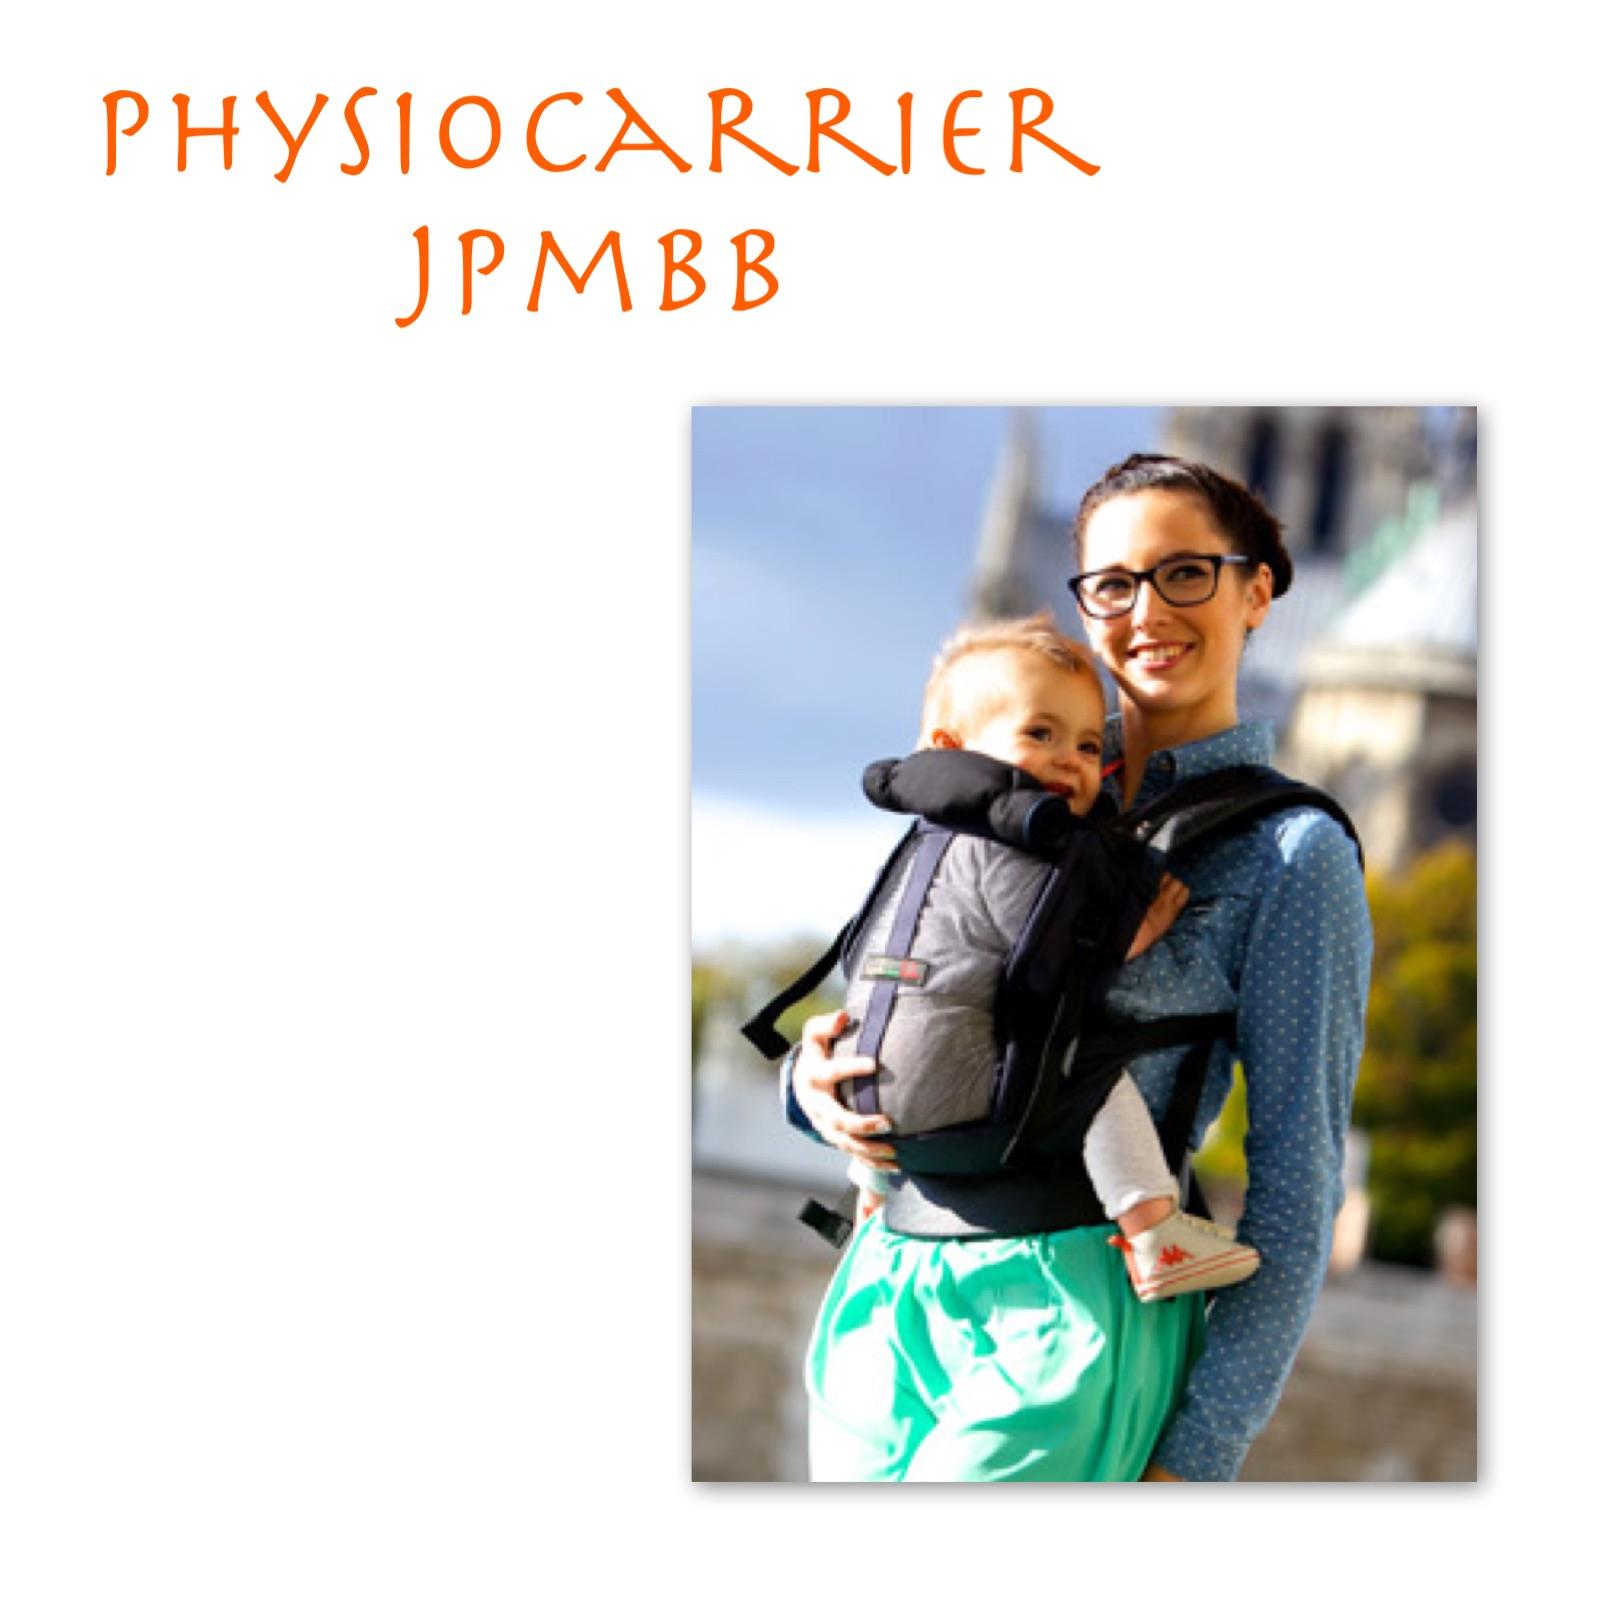 Physiocarrier Love Radius (JPMBB)